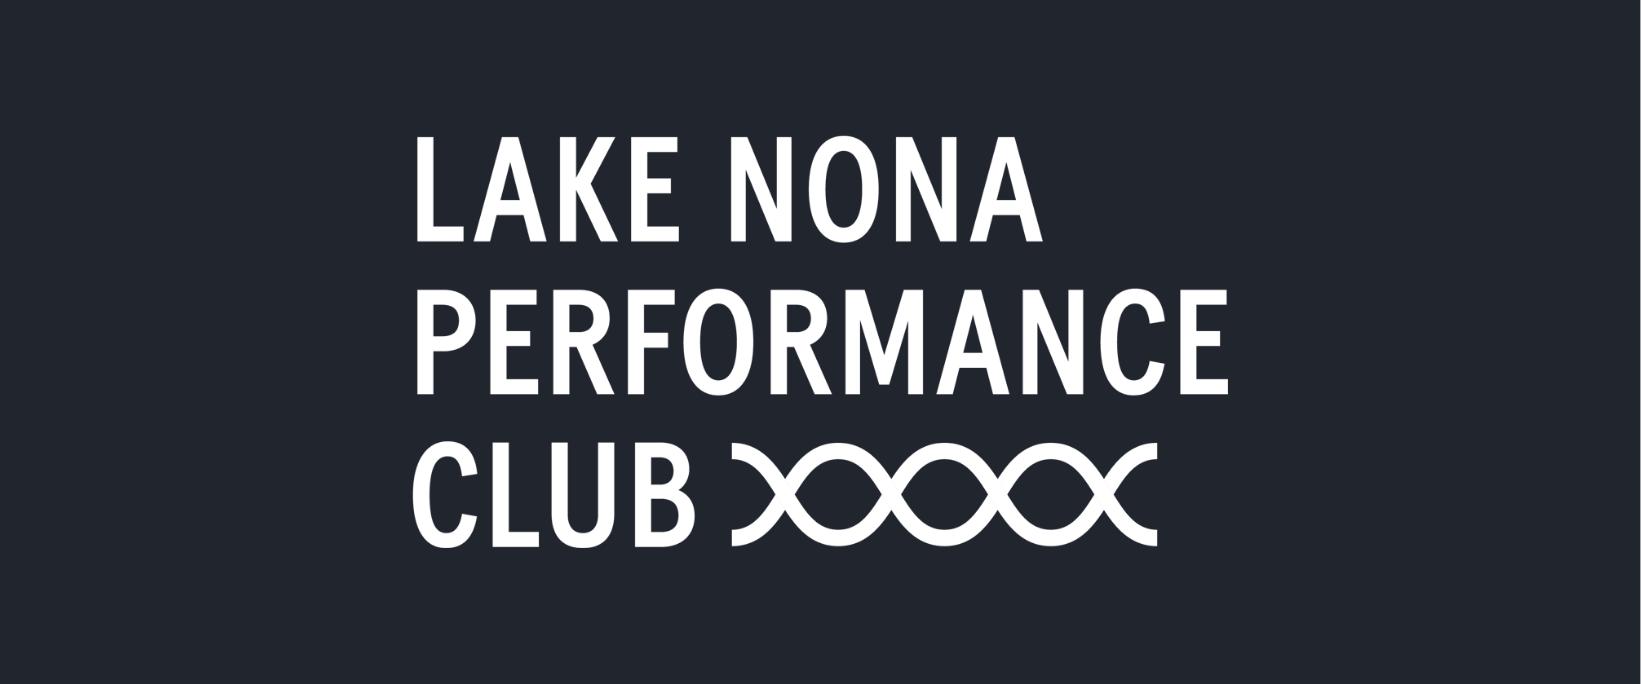 Lake Nona Performance Club